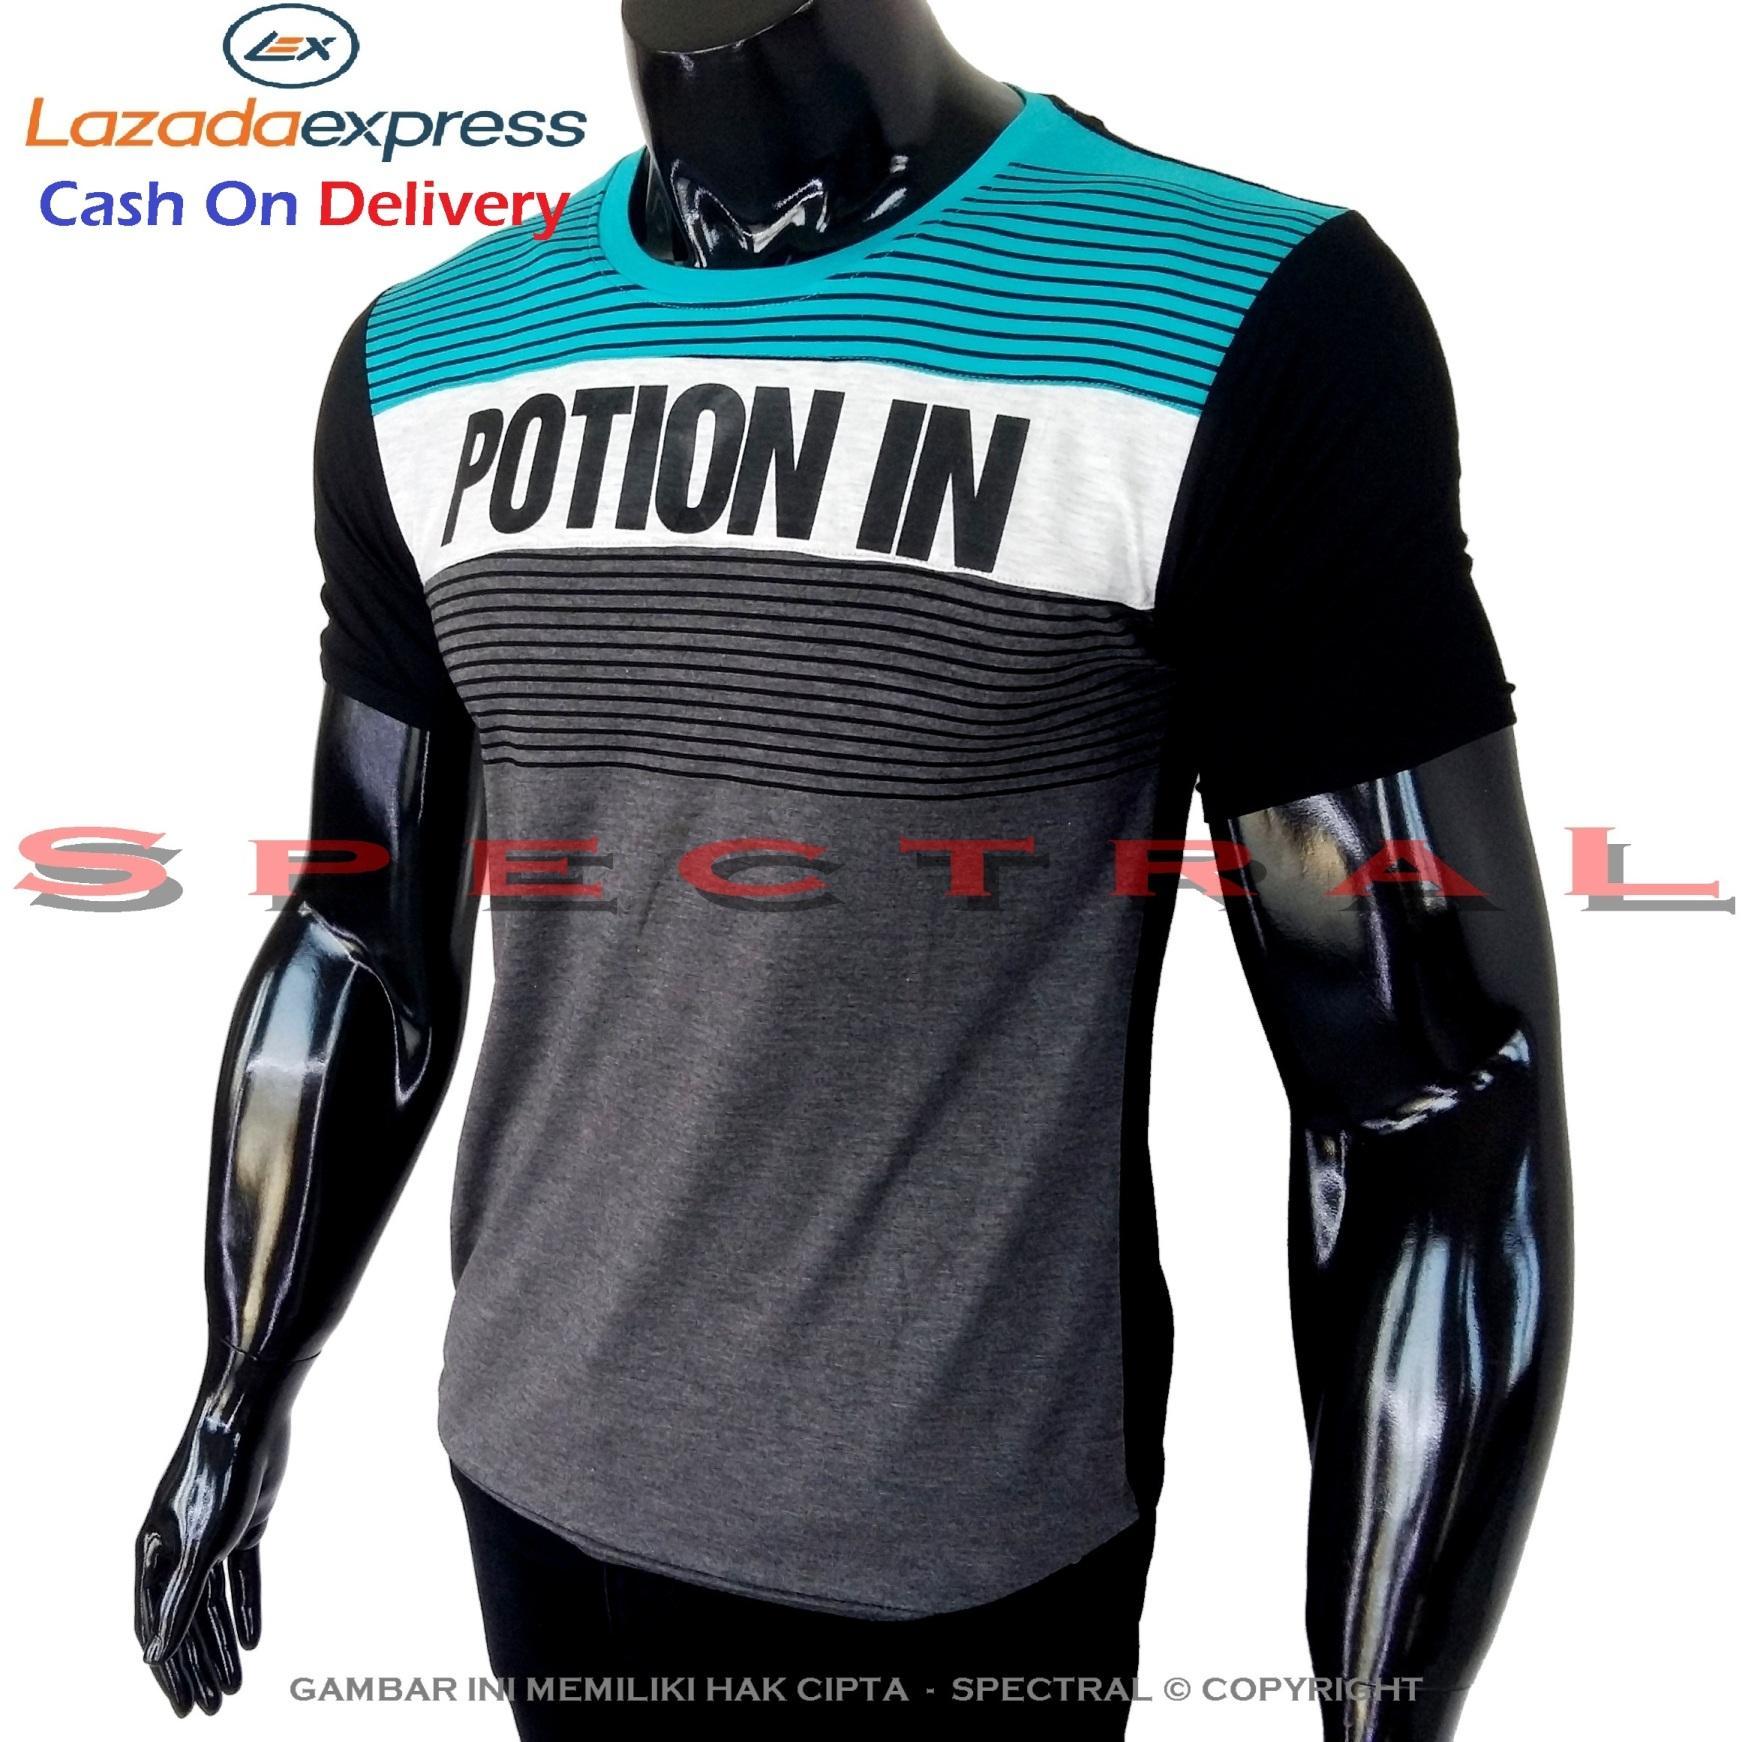 Spectral - Kaos Distro POTION IN Soft Rayon Viscose Lycra Pola M Fit To L Simple Fashionable Tidak Pasaran Kombinasi Garis Motif Art Visual